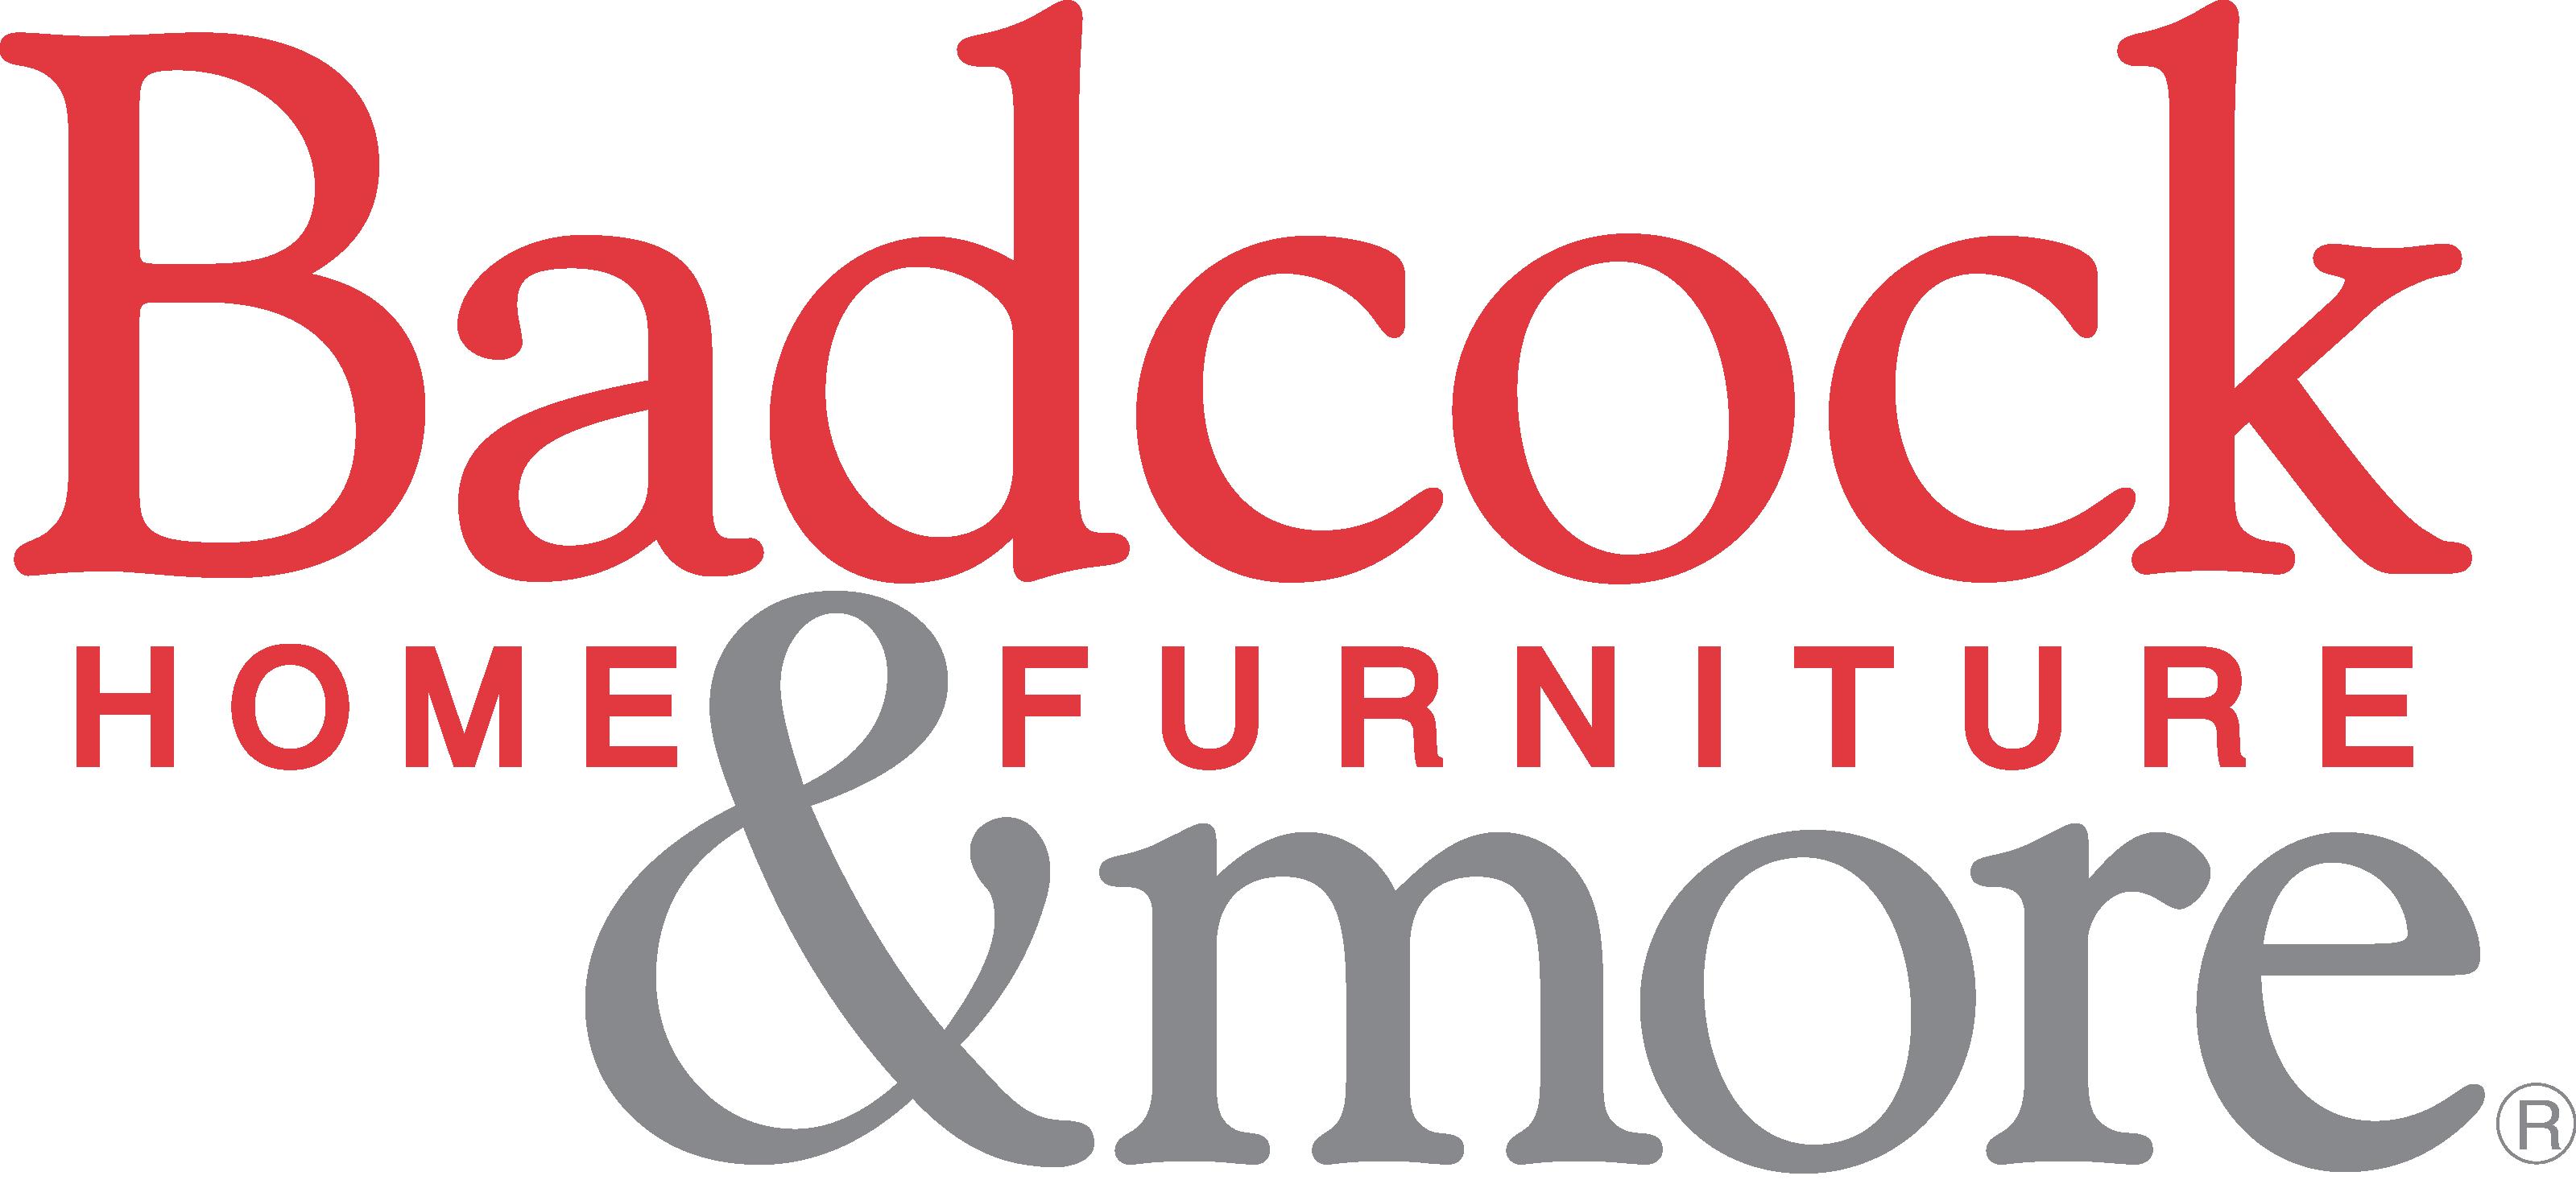 Badcock Furniture- Frostproof